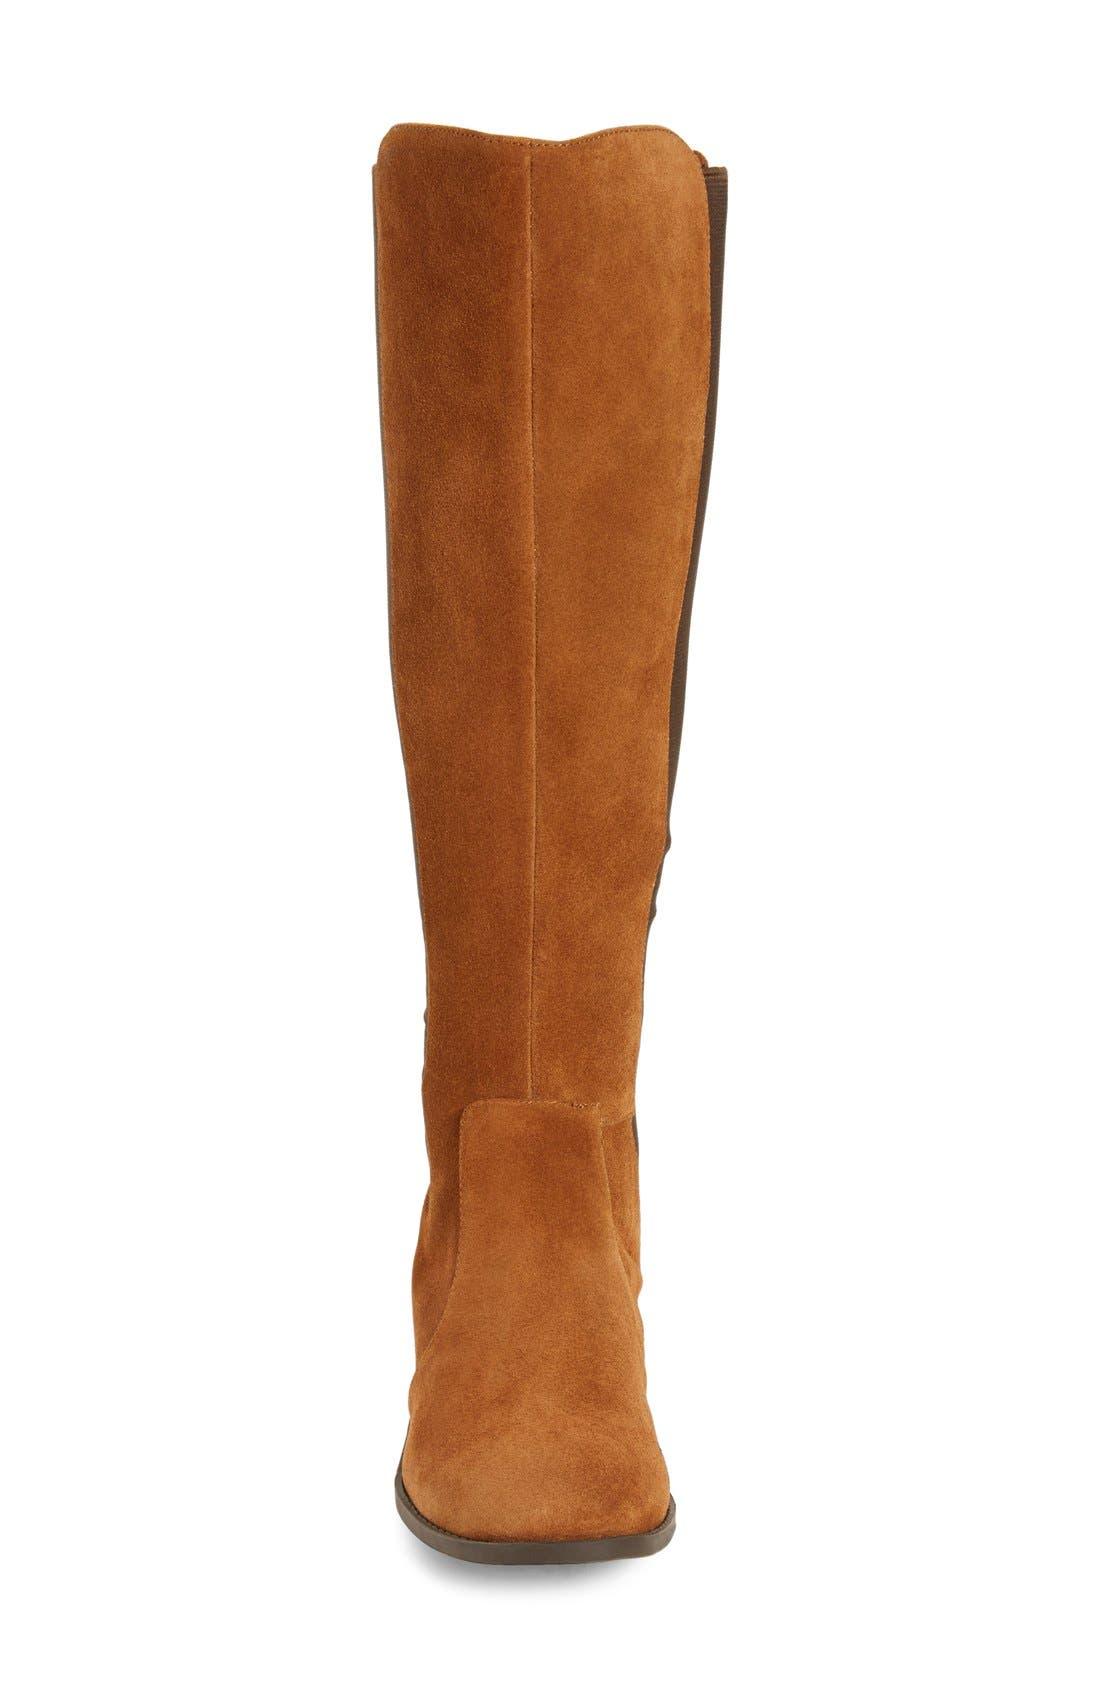 Alternate Image 3  - Jessica Simpson 'Ricel' Riding Boot (Women) (Regular & Wide Calf)